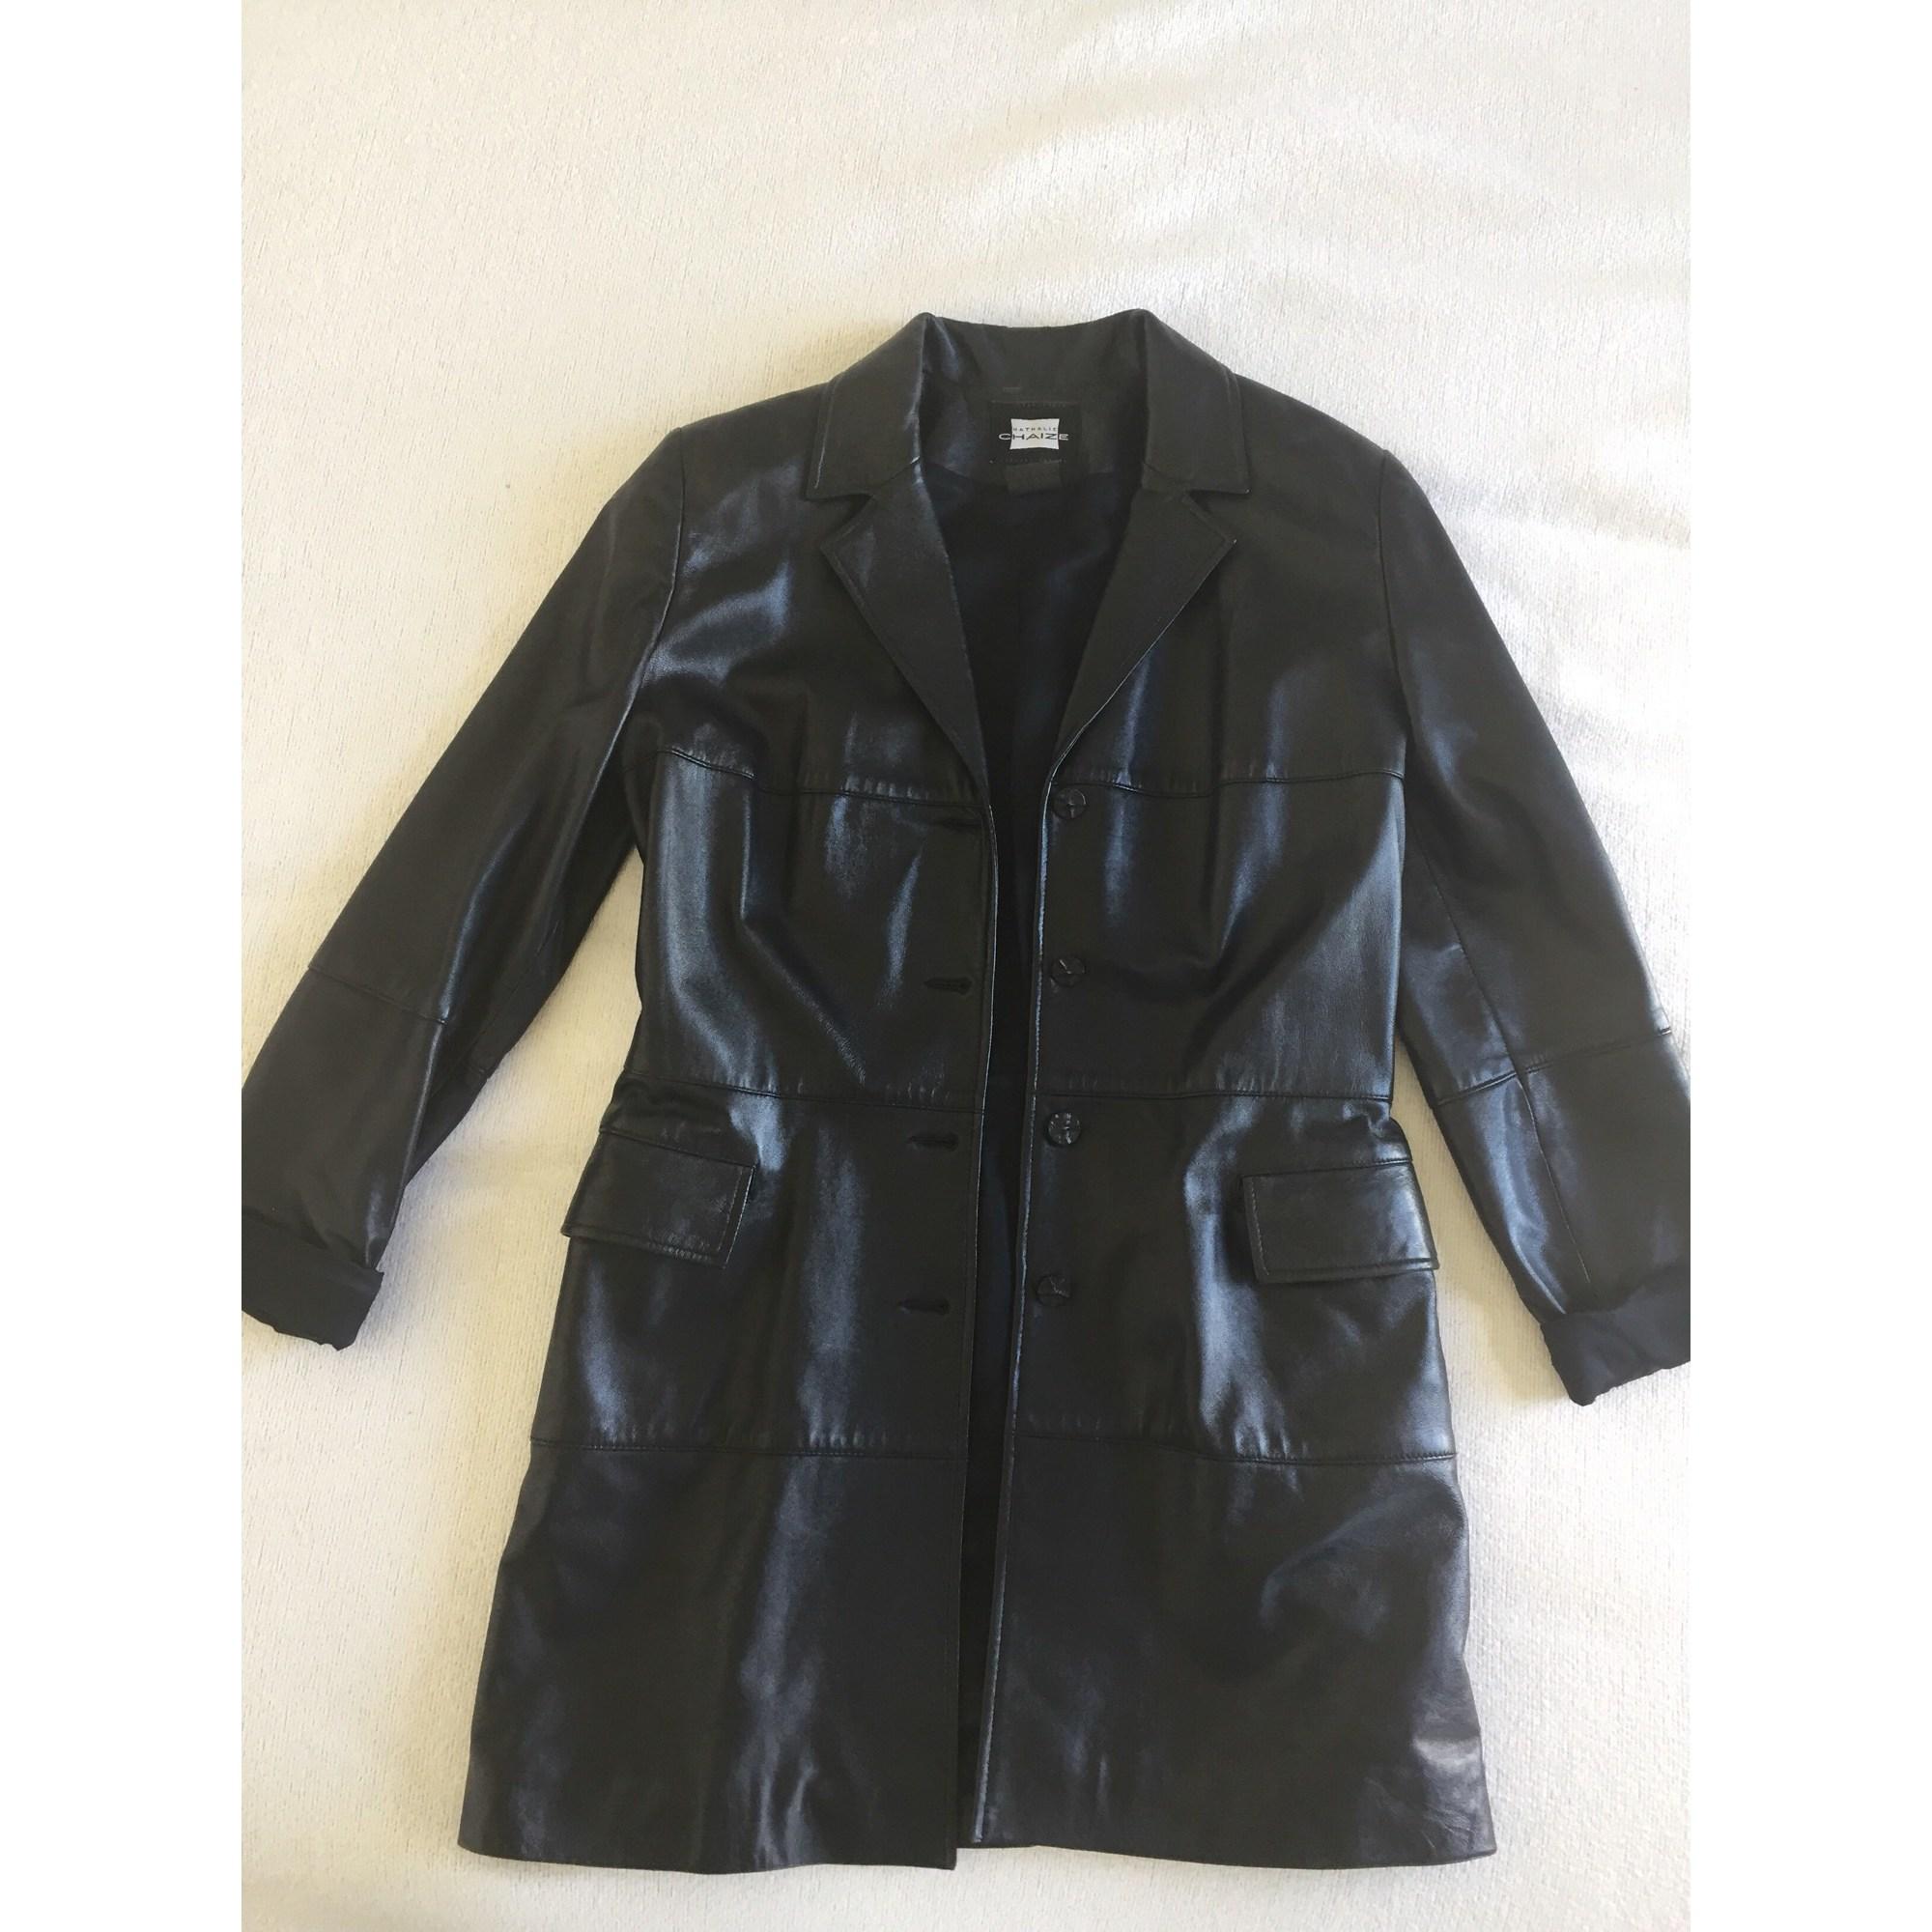 Manteau en cuir NATHALIE CHAIZE Noir